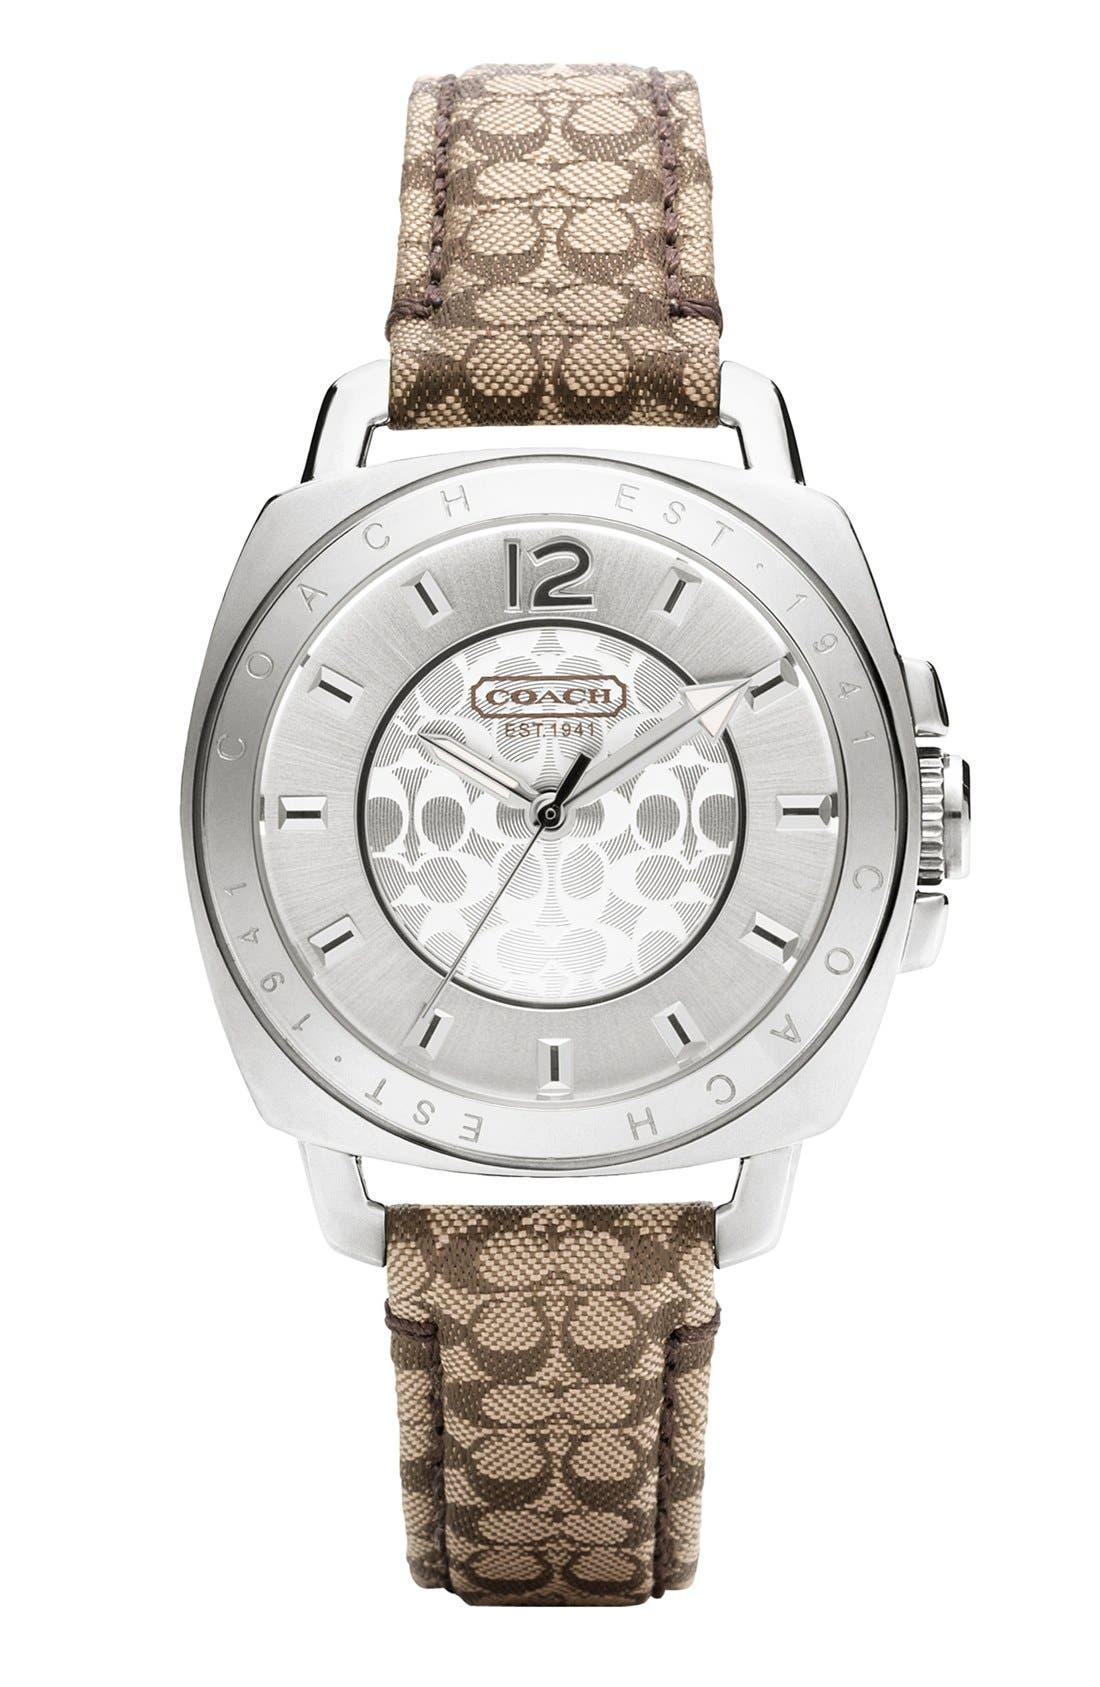 Main Image - COACH 'Boyfriend' Signature Strap Watch, 35mm